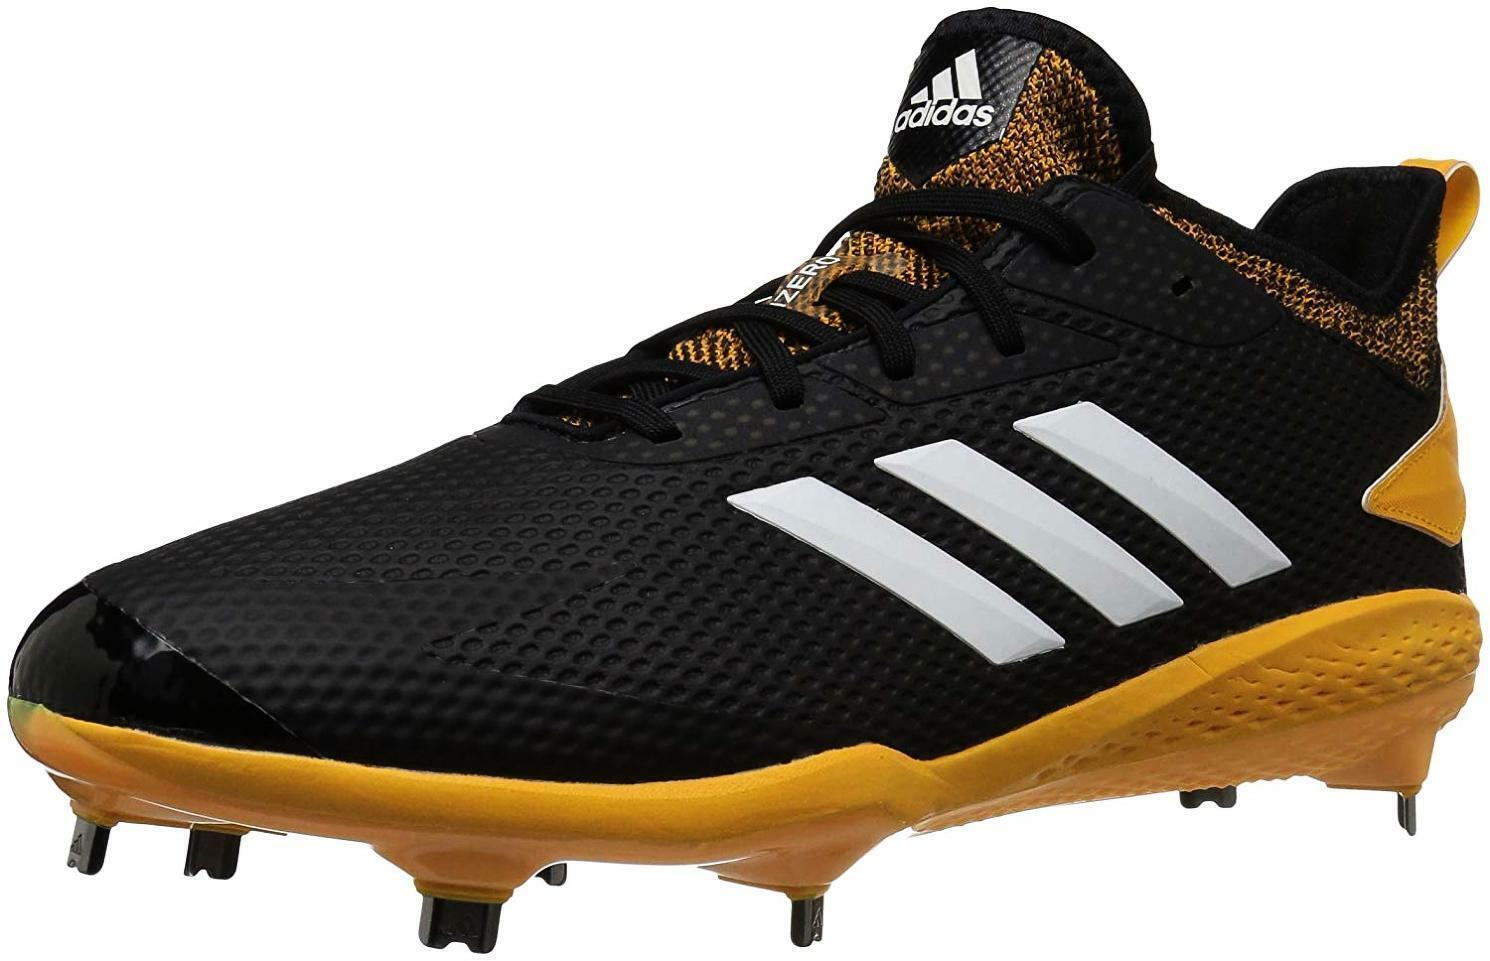 Adidas Men's Adizero Afterburner V Baseball shoes - Choose SZ color